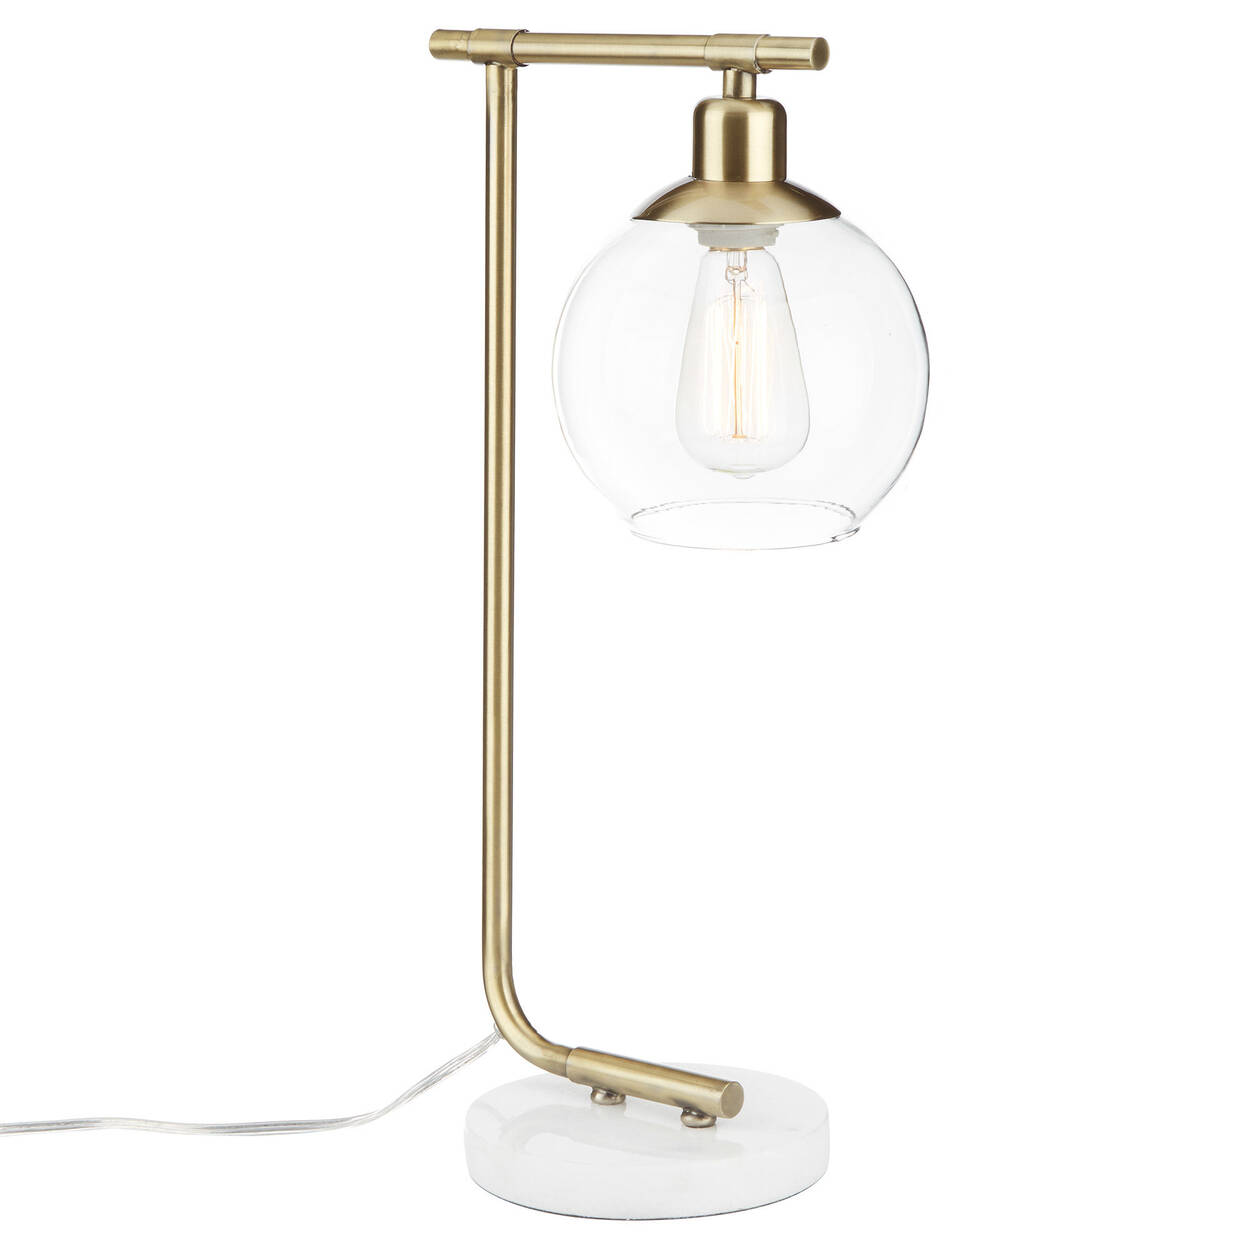 Lampe de table en métal, en marbre et en verre